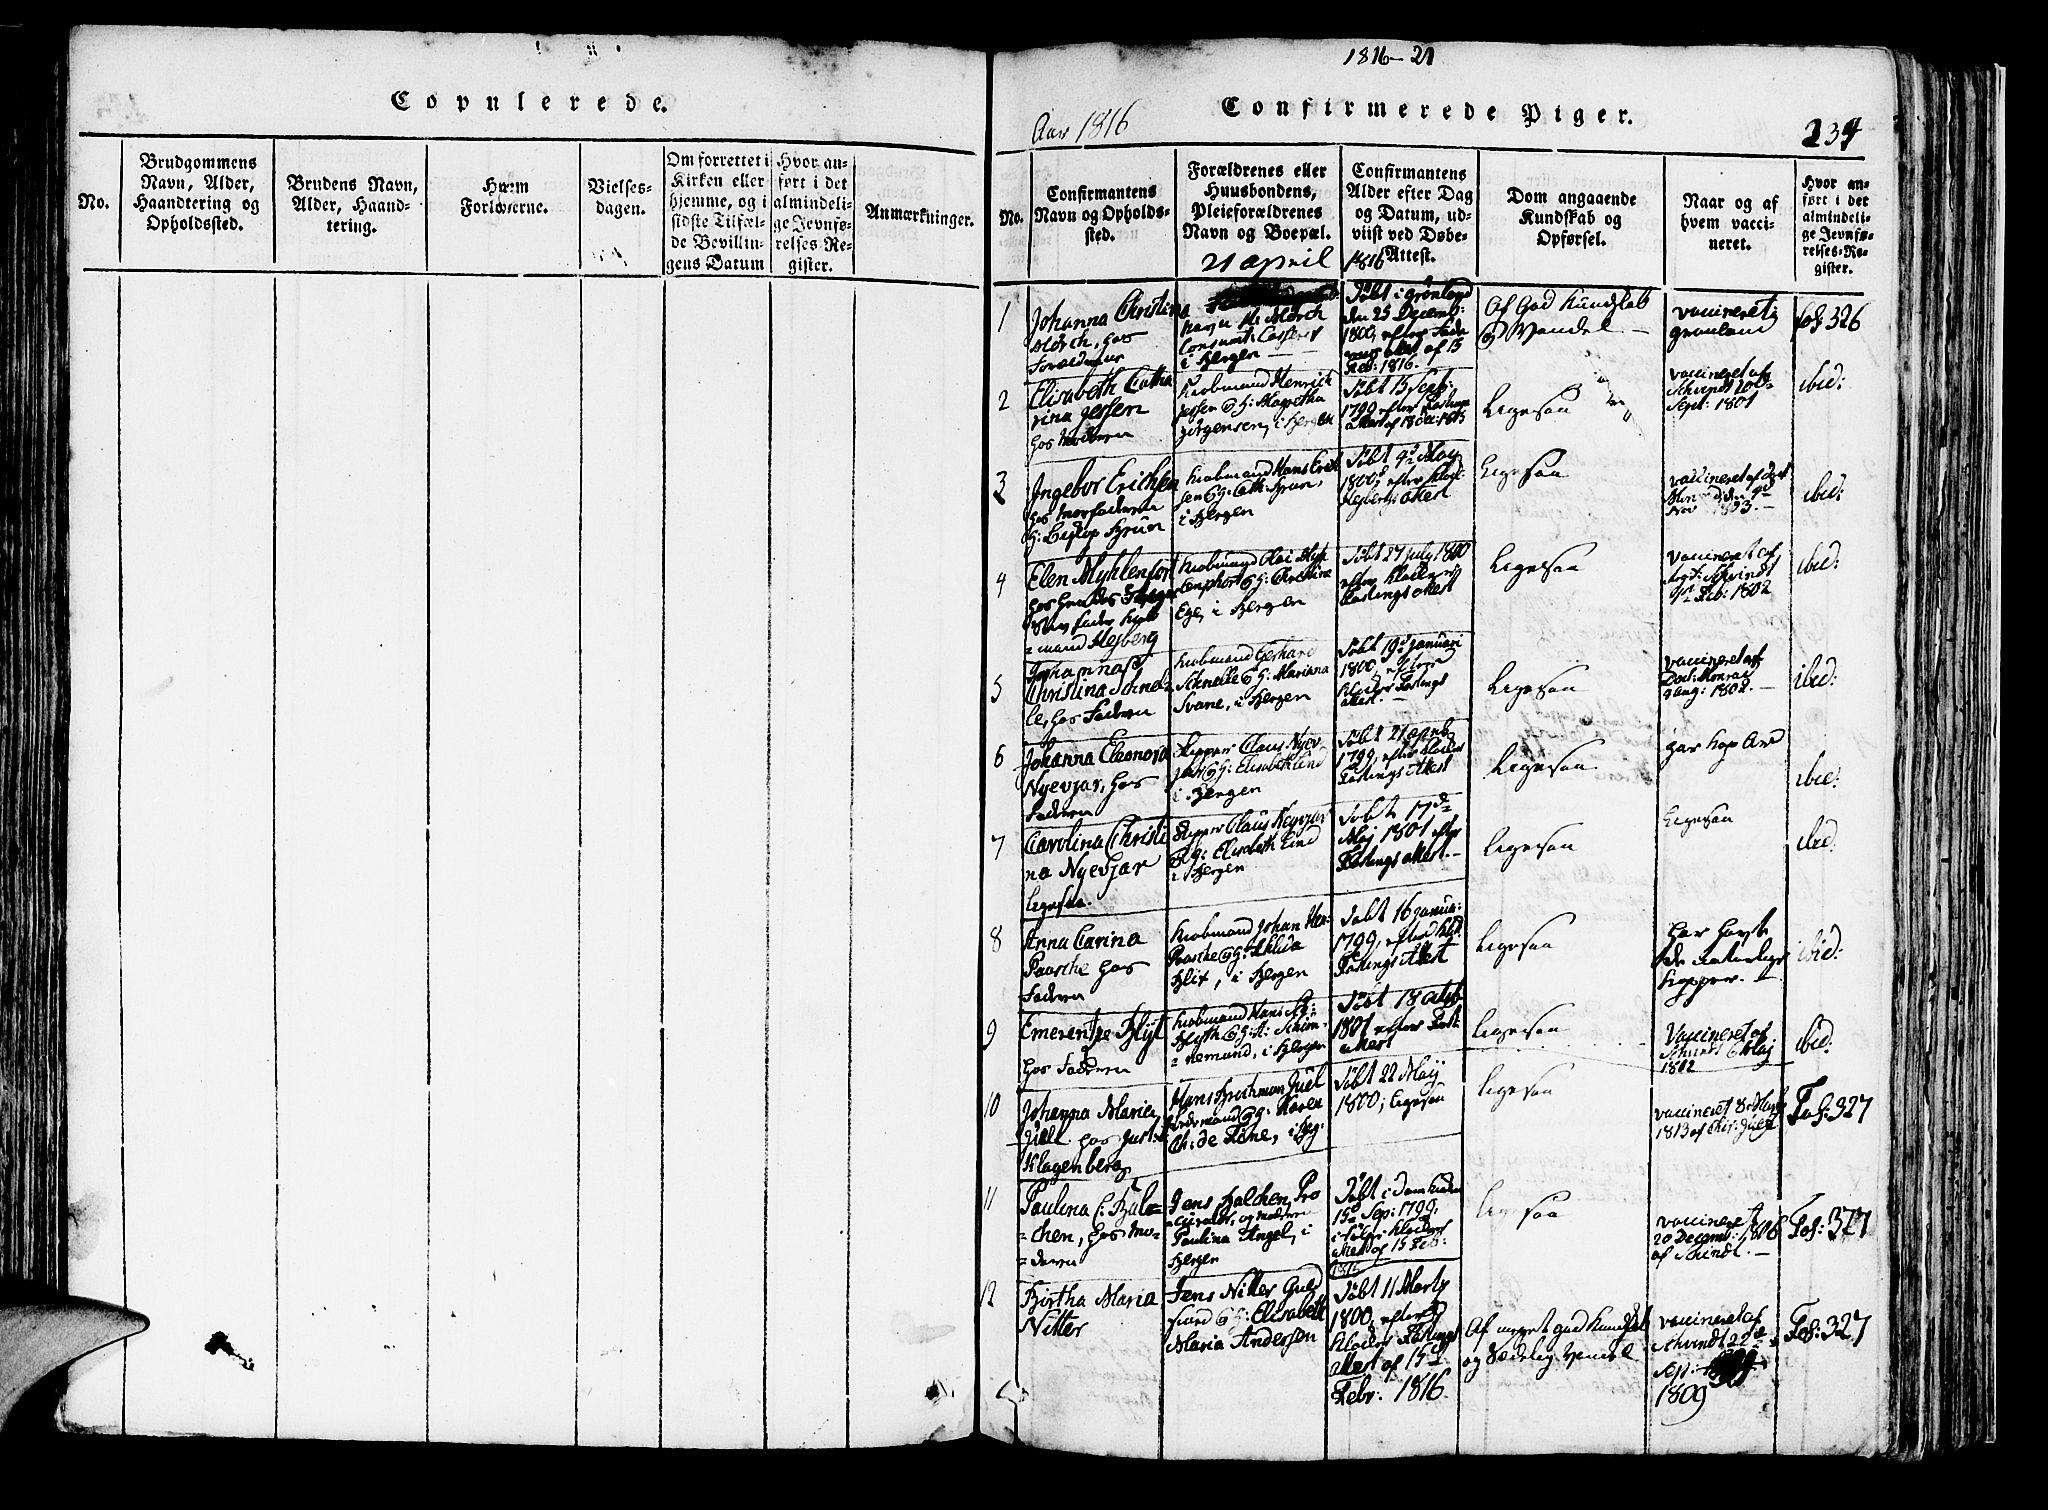 SAB, Domkirken Sokneprestembete, H/Haa/L0010: Ministerialbok nr. A 10, 1816-1821, s. 234